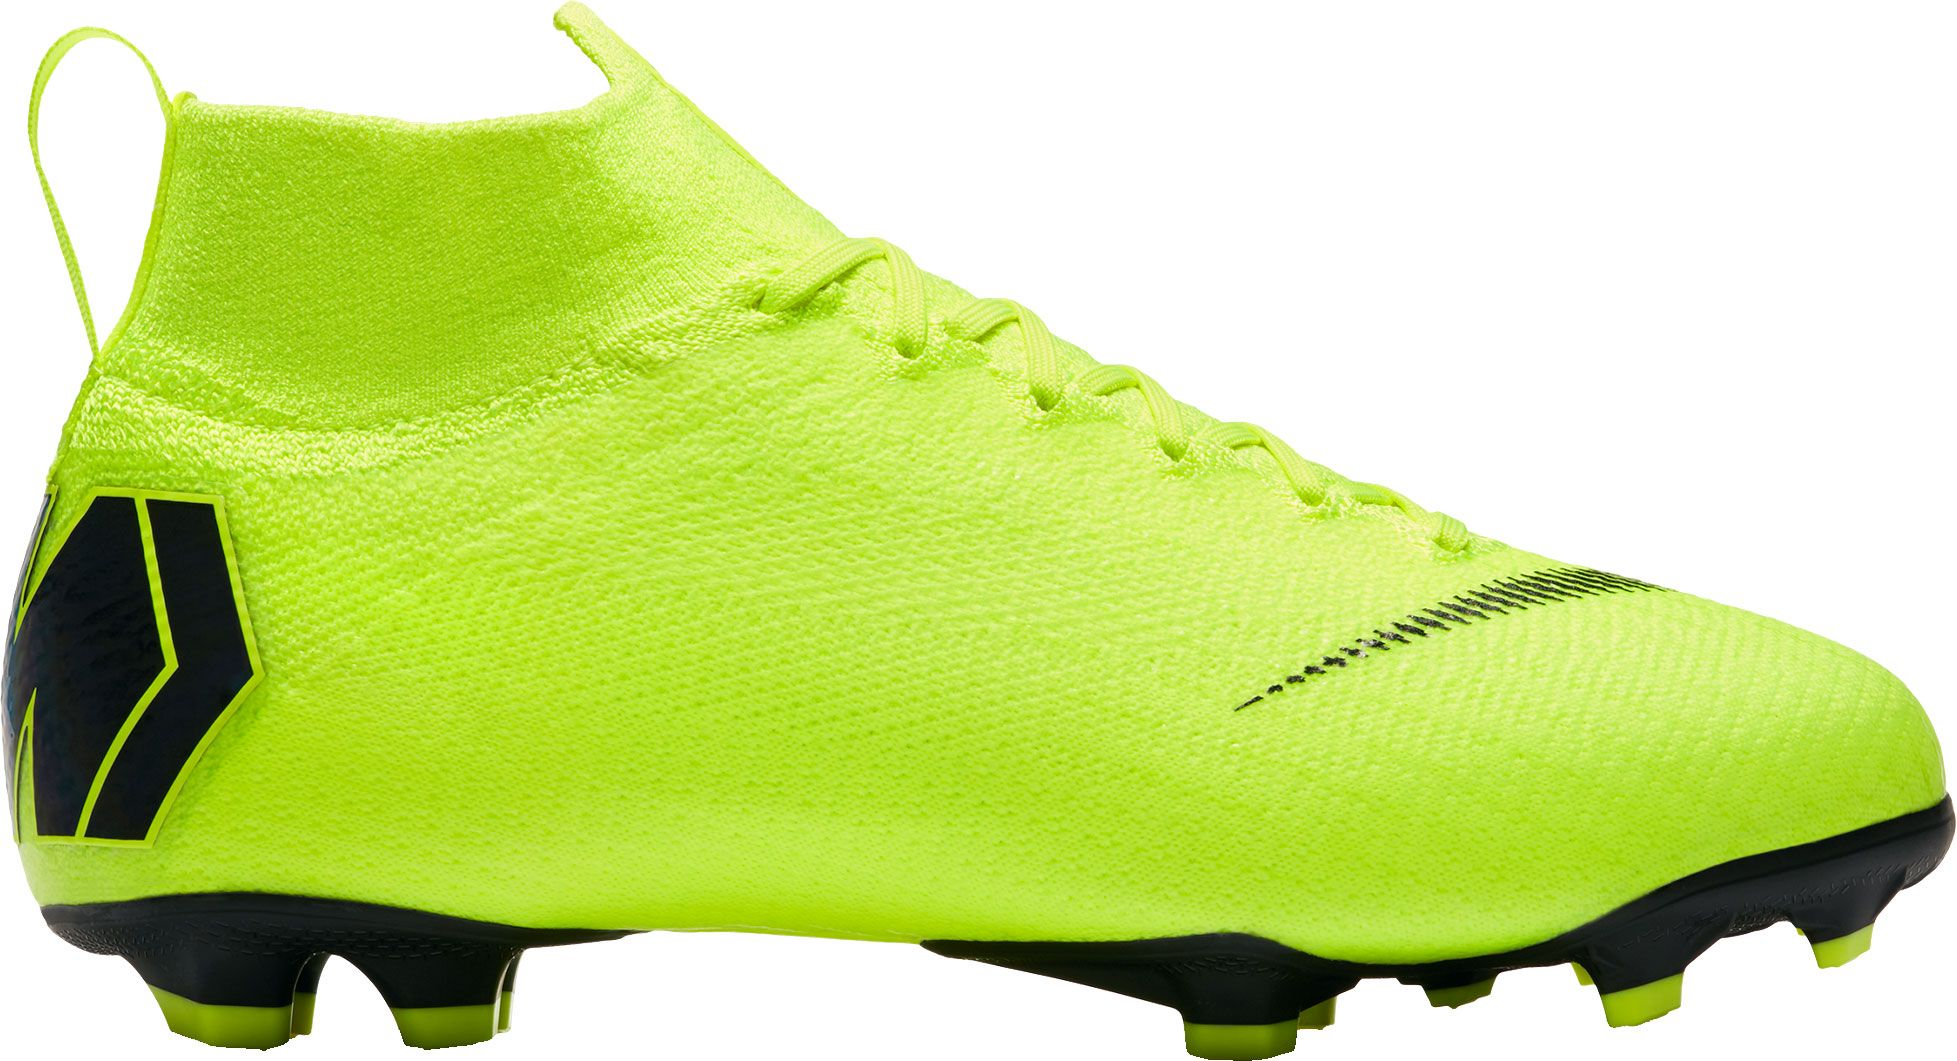 Nike Kids' Mercurial Superfly 360 Elite FG Soccer Cleats, Boy's, Size: 5.0, Green